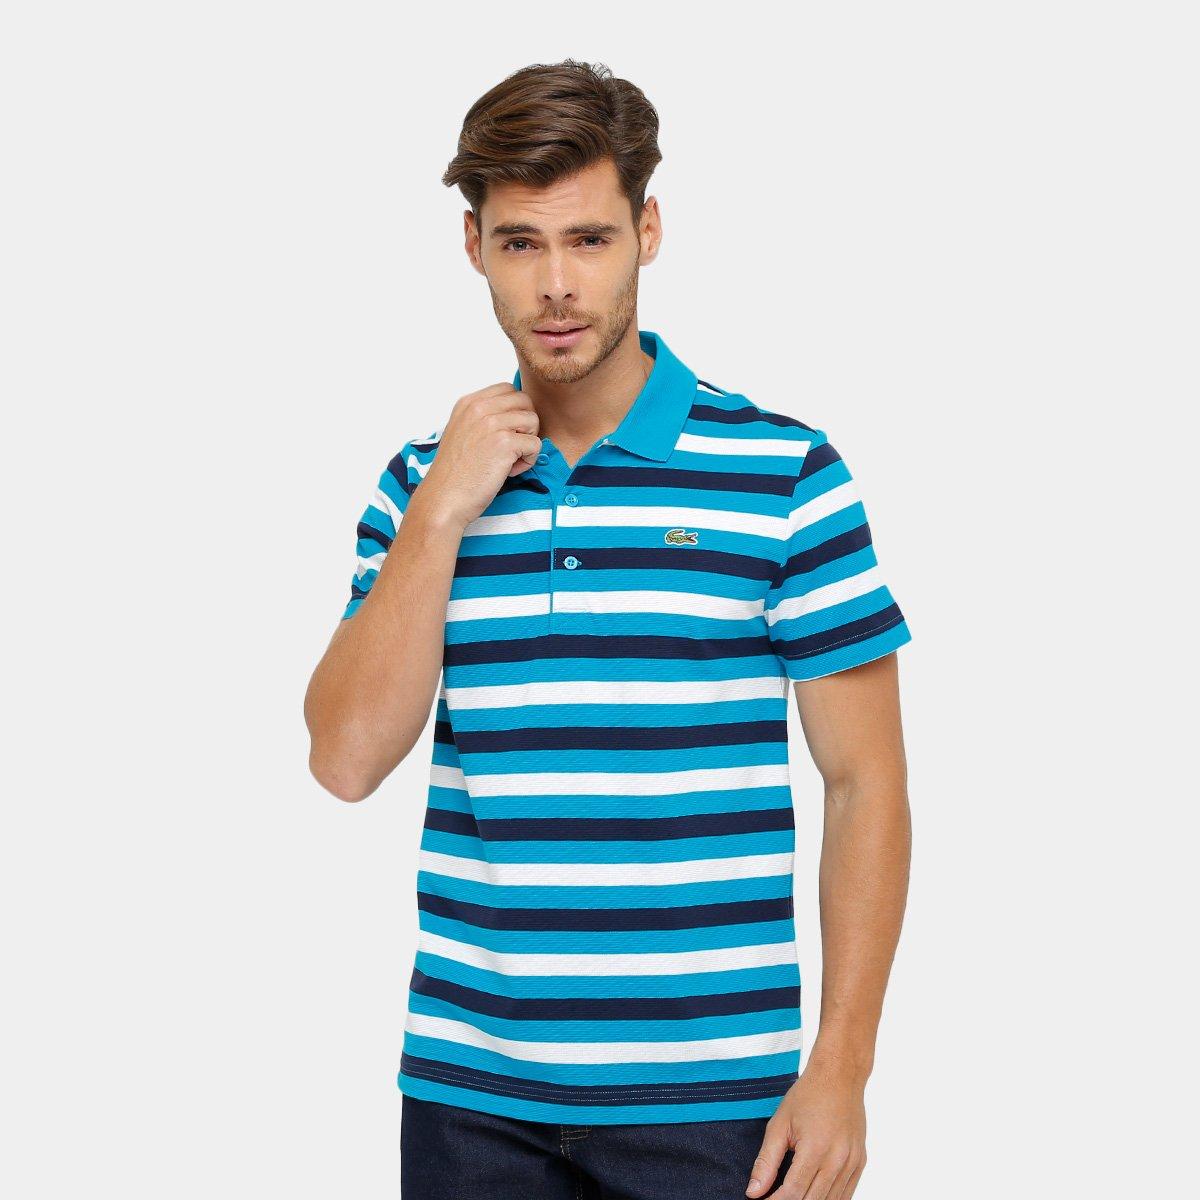 8e74f10bc3462 Camisa Polo Lacoste Listrada Masculina - Compre Agora